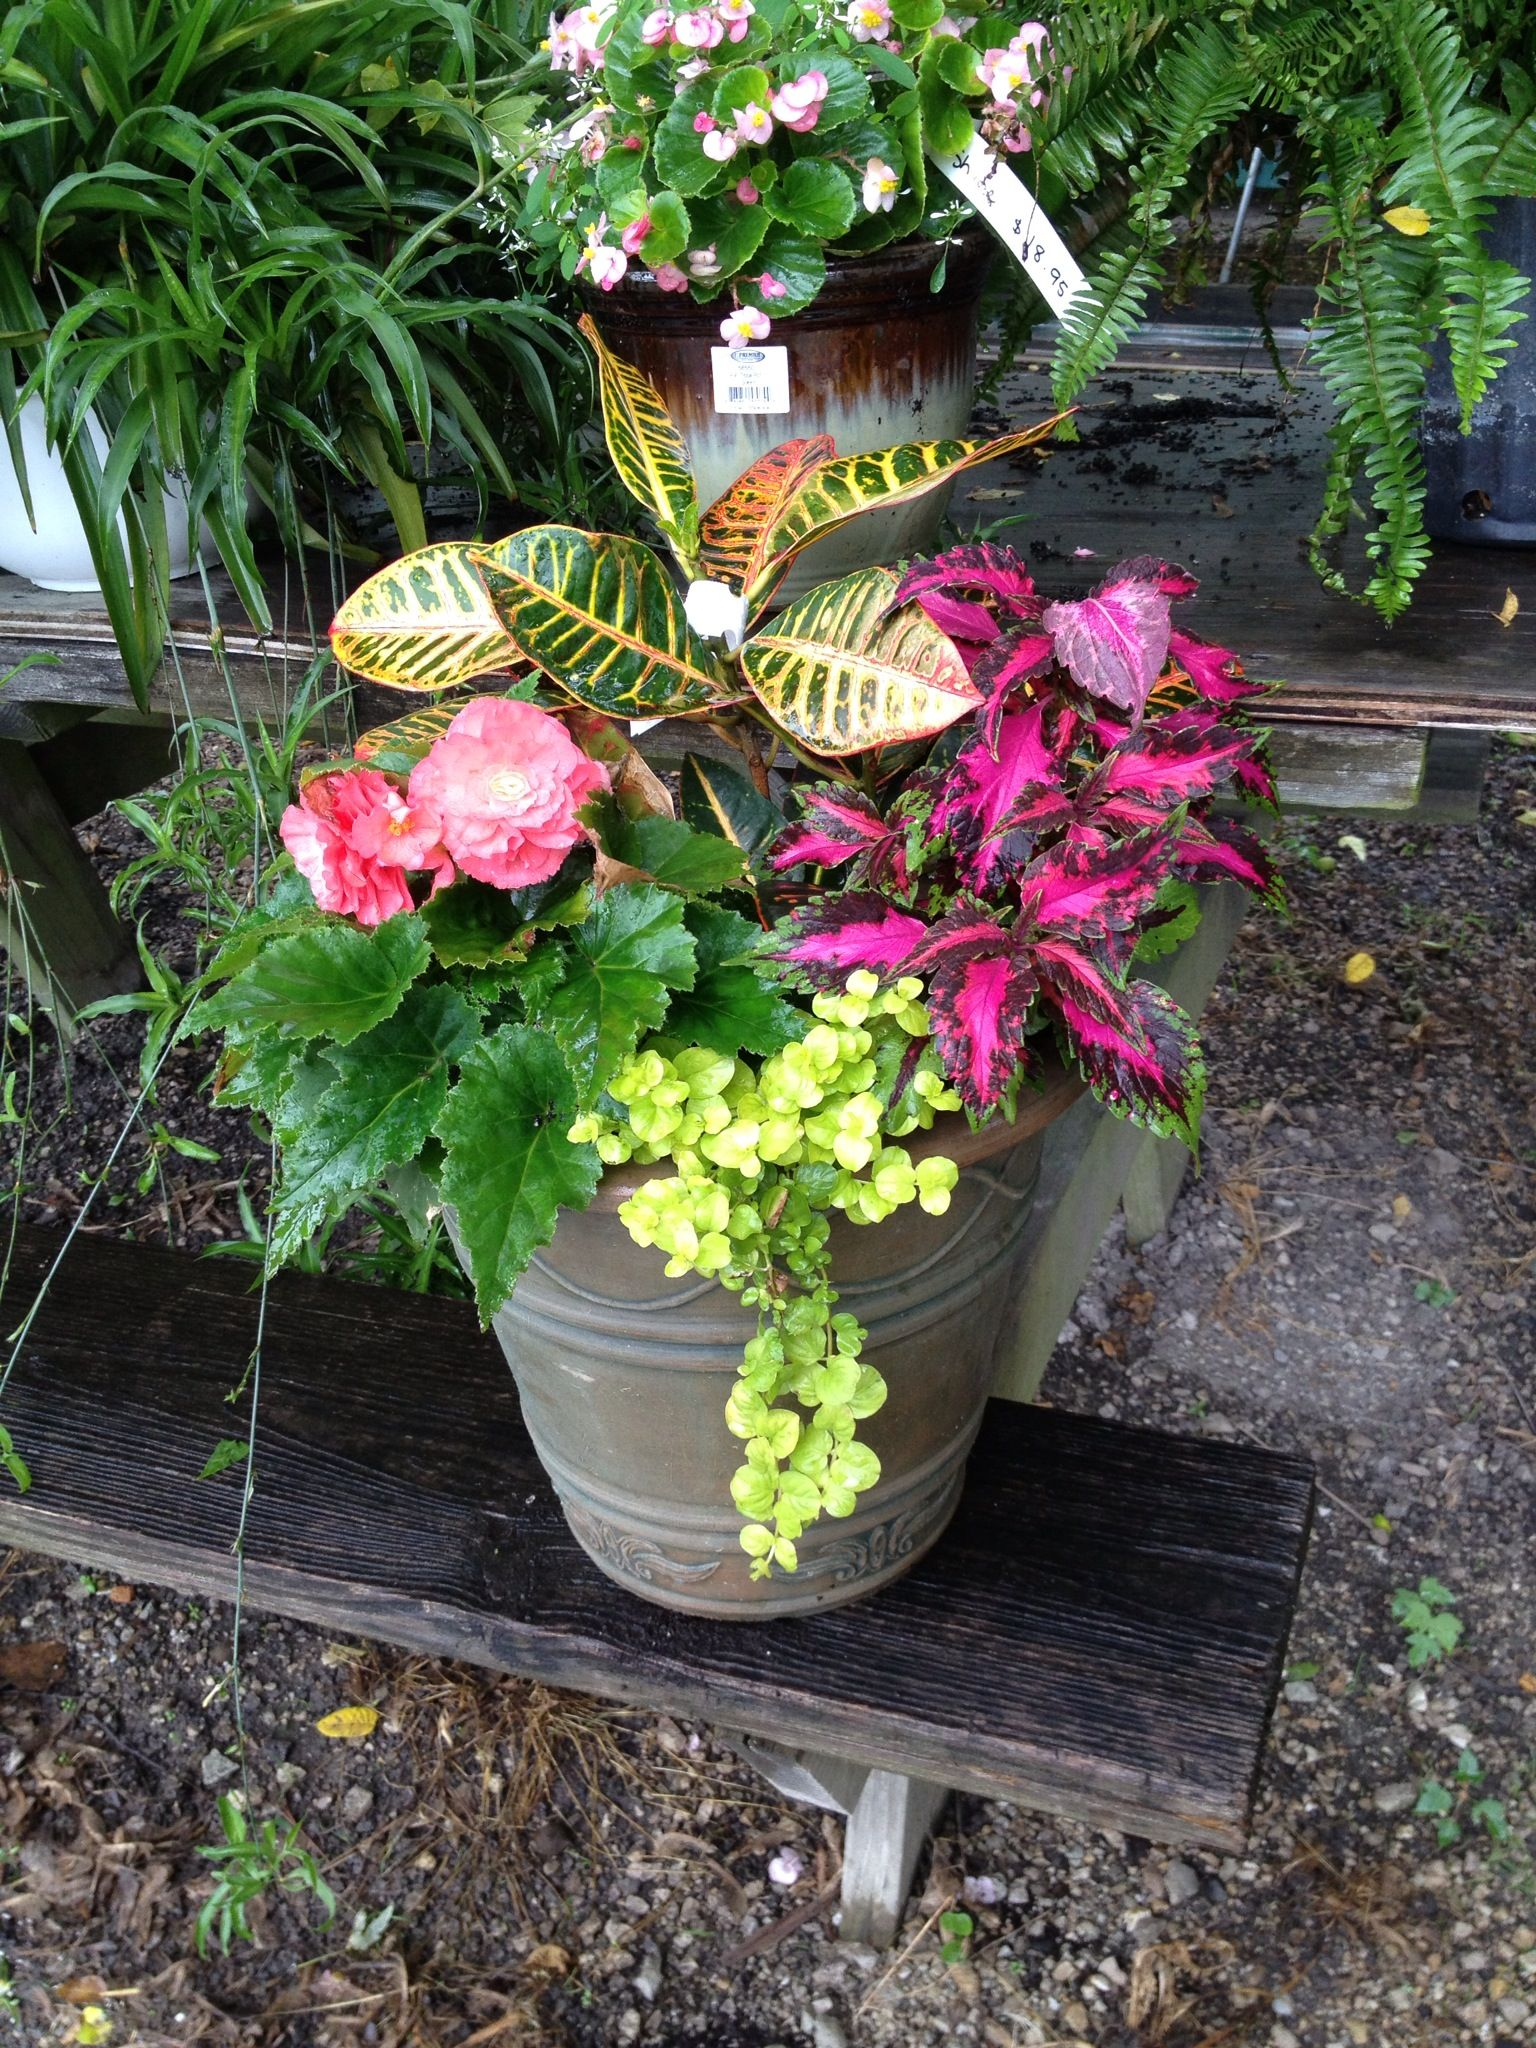 Croton Coleus Tuberous Begonia And Creeping Jenny Make For A Colorful Shade Planter Garden Containers Garden Pots Side Garden